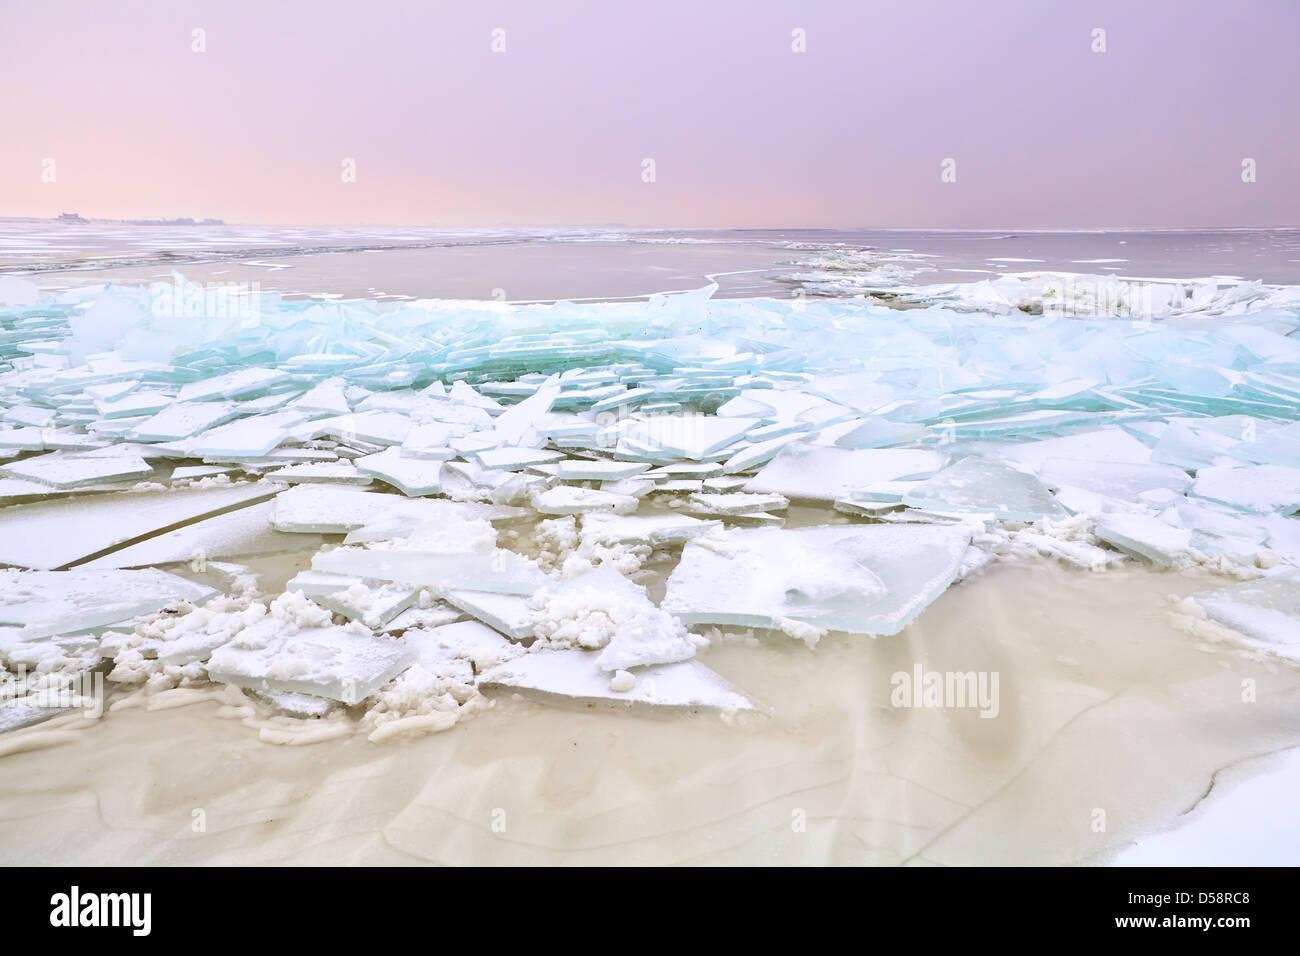 Estante de hielo congeladas Ijmuiden al atardecer, Holanda Imagen De Stock